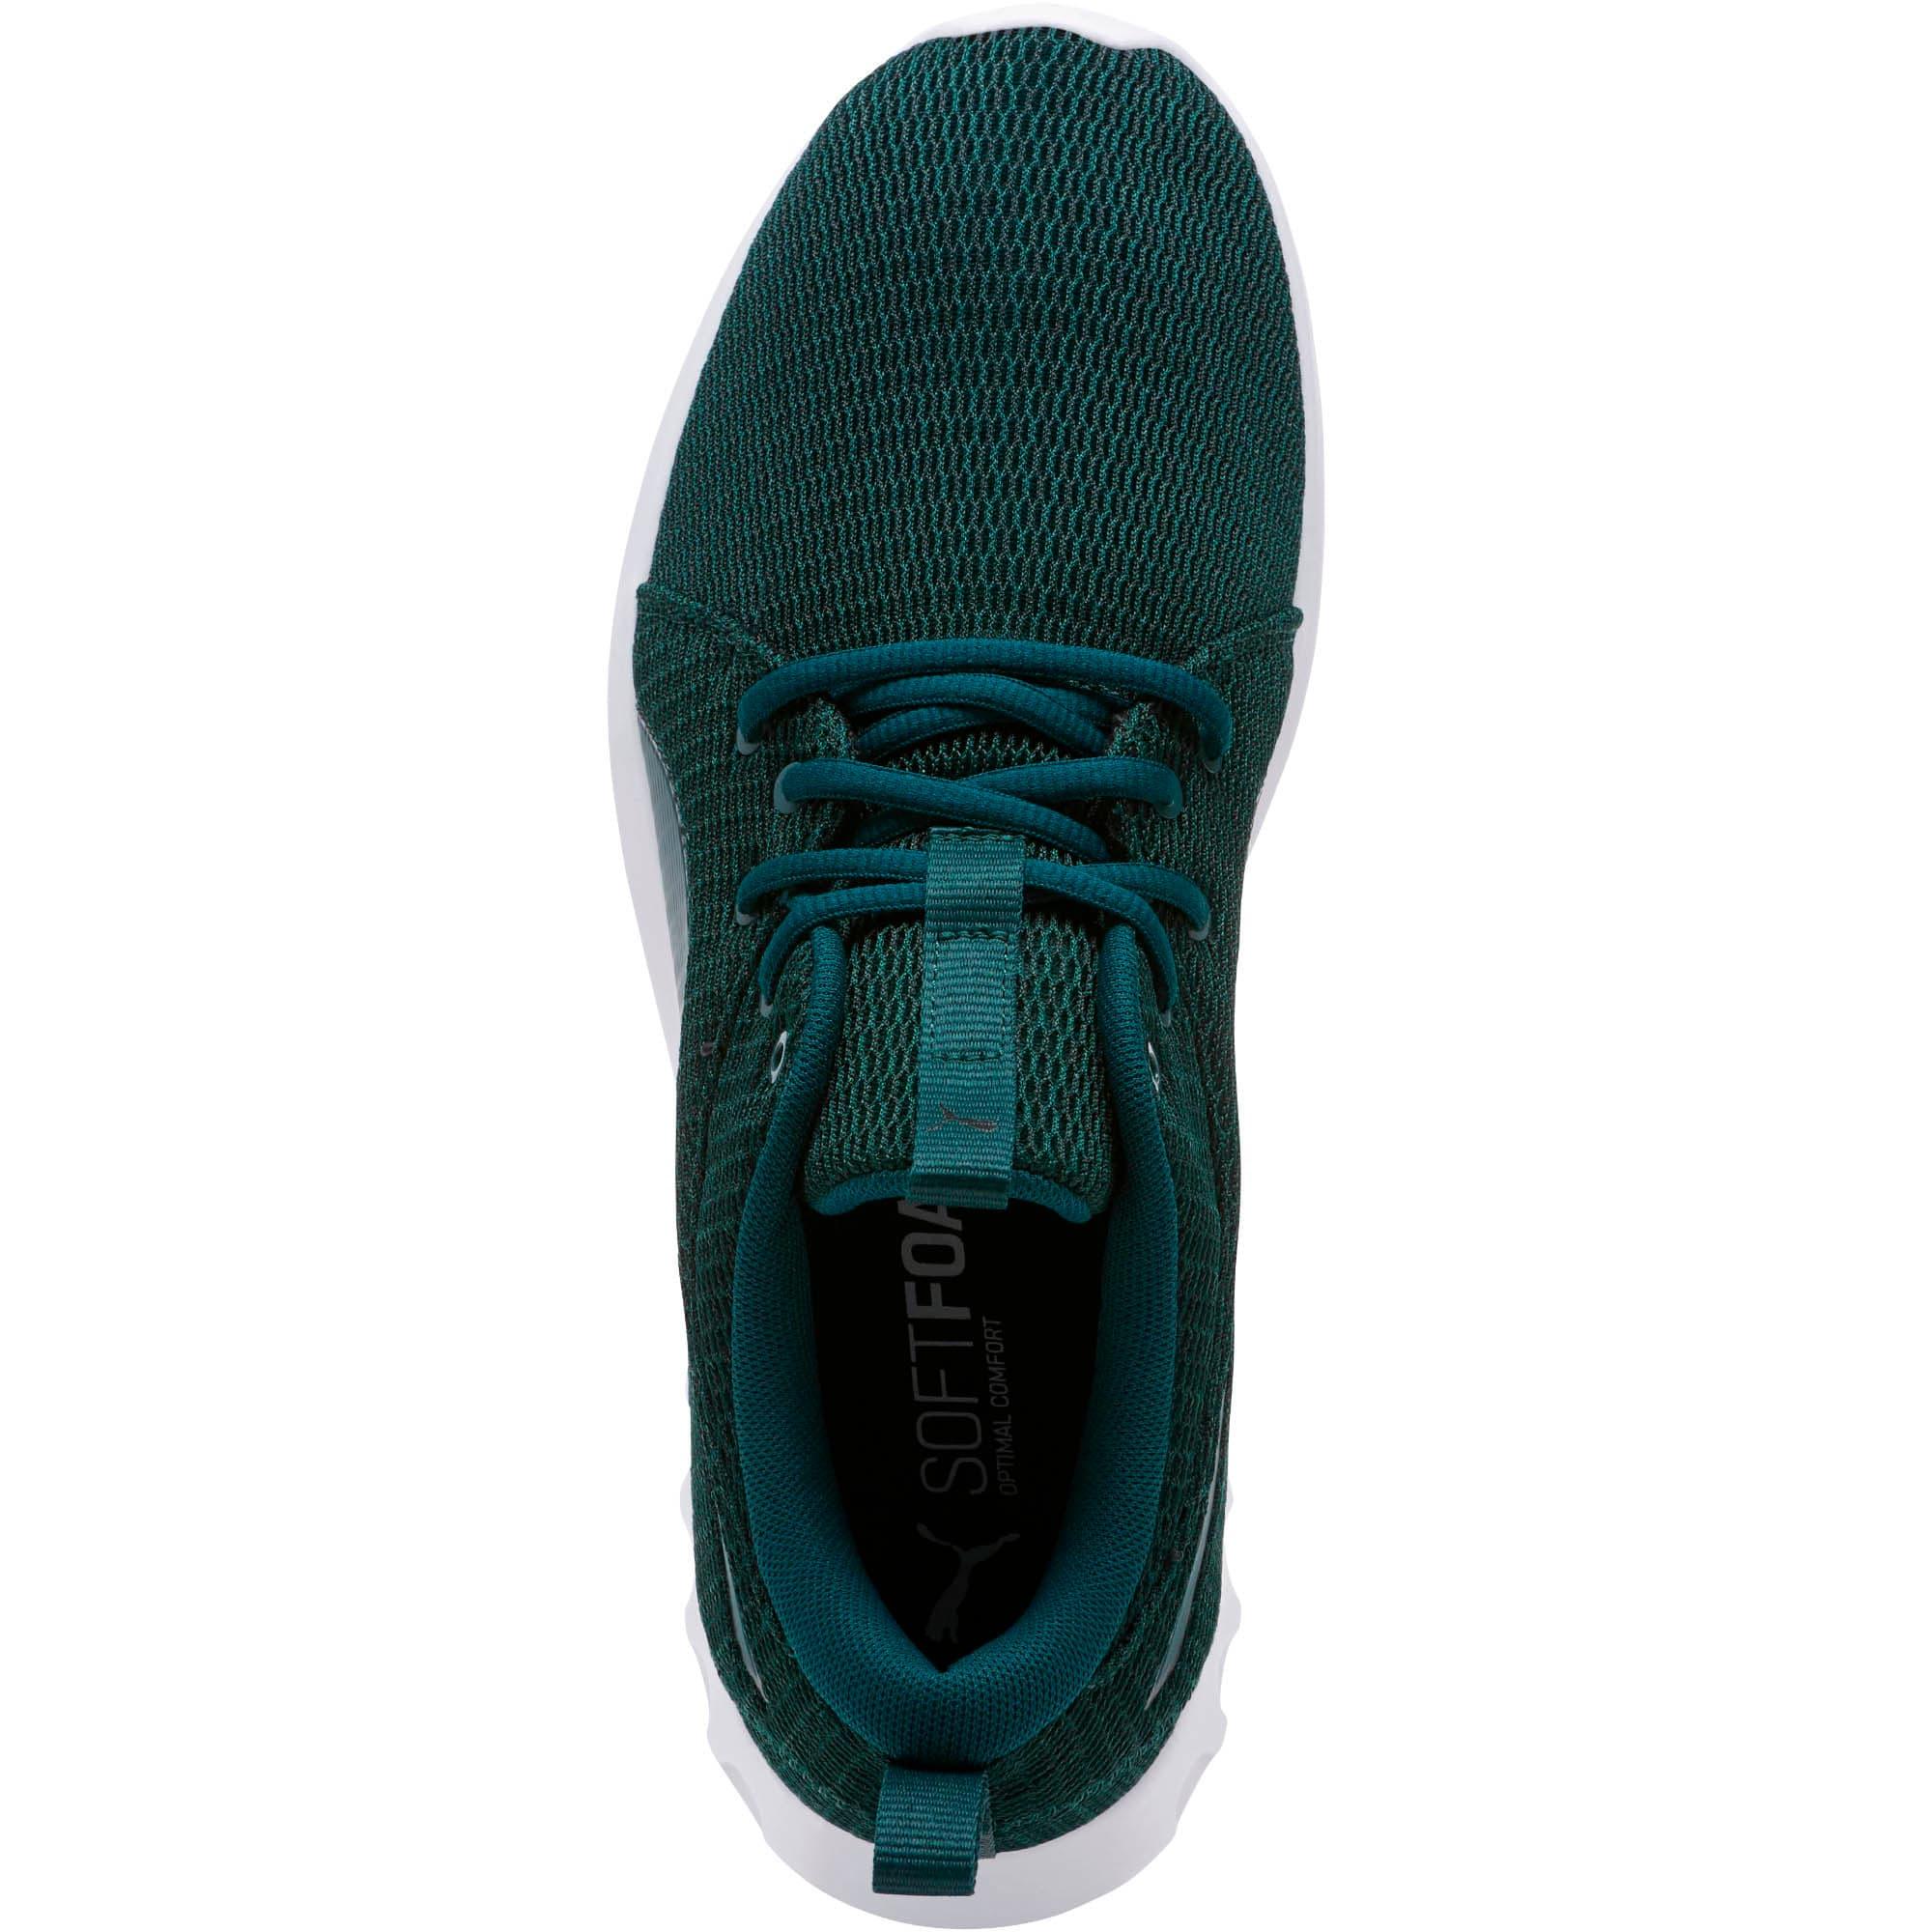 Miniatura 5 de Zapatos para correrCarson 2 New Corepara hombre, Ponderosa Pine-Puma White, mediano